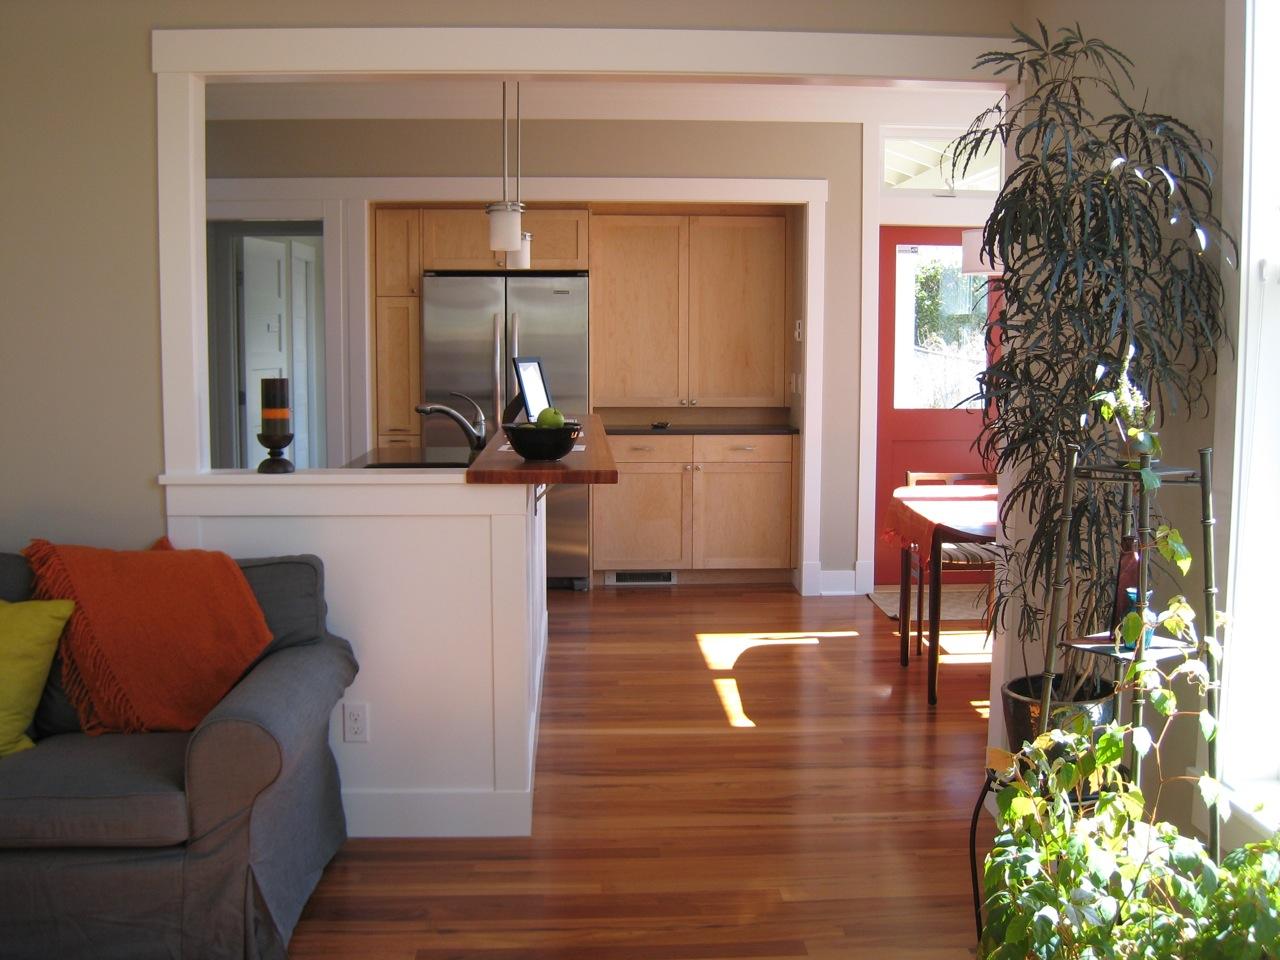 interior wall color world of colors interior. Black Bedroom Furniture Sets. Home Design Ideas